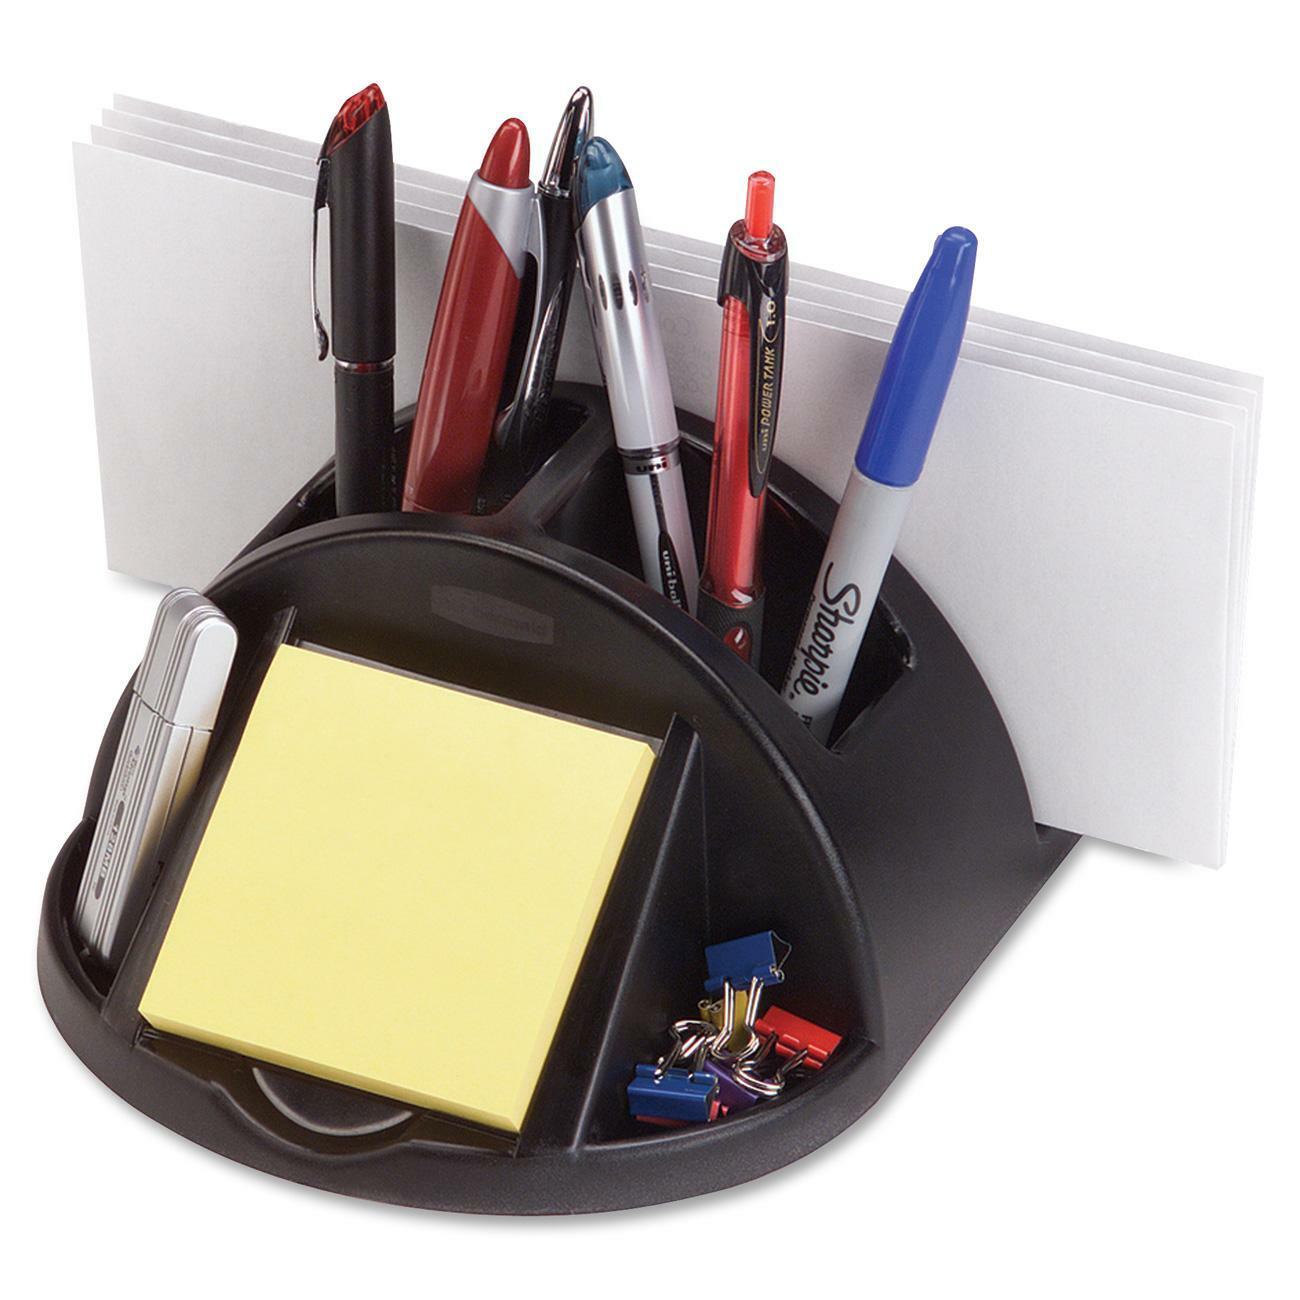 Ocean Stationery And Office Supplies Desk Organizers Desktop Holders Rubbermaid Director